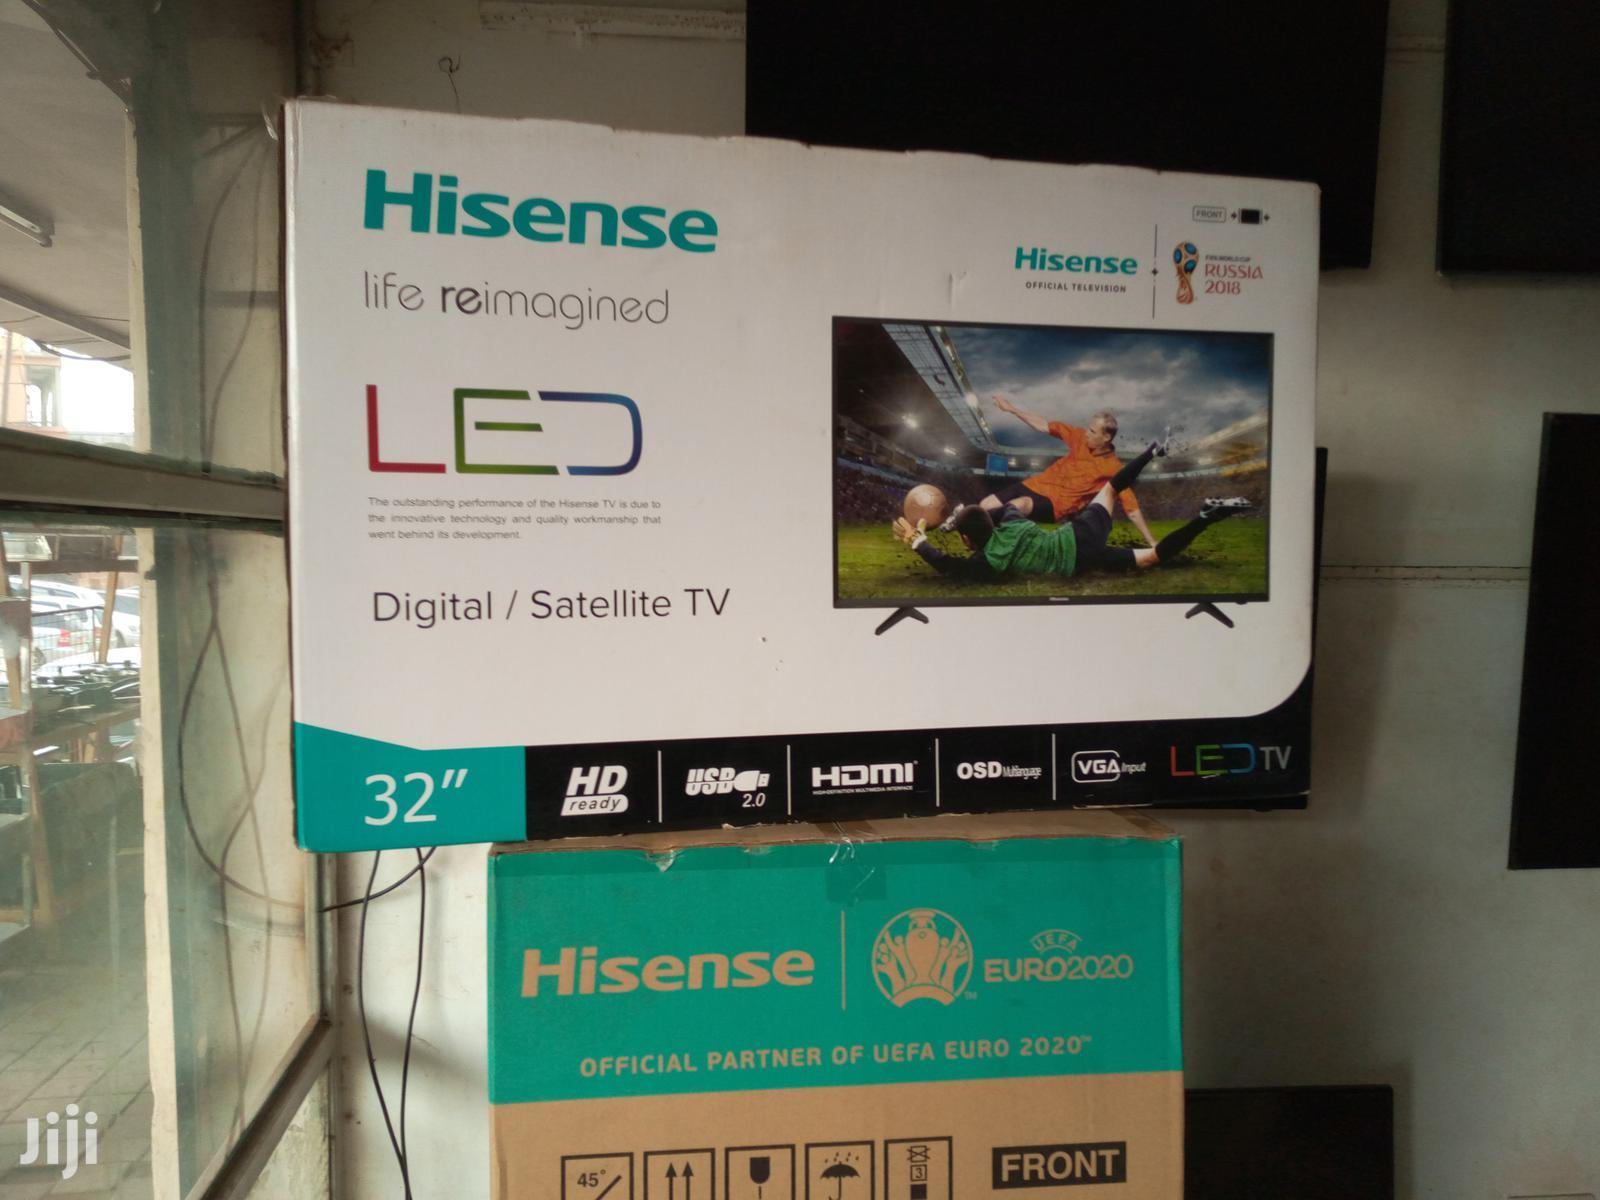 Hisense Digital Satellite Full HD Led Flat Screen Tv 32 Inches   TV & DVD Equipment for sale in Kampala, Central Region, Uganda